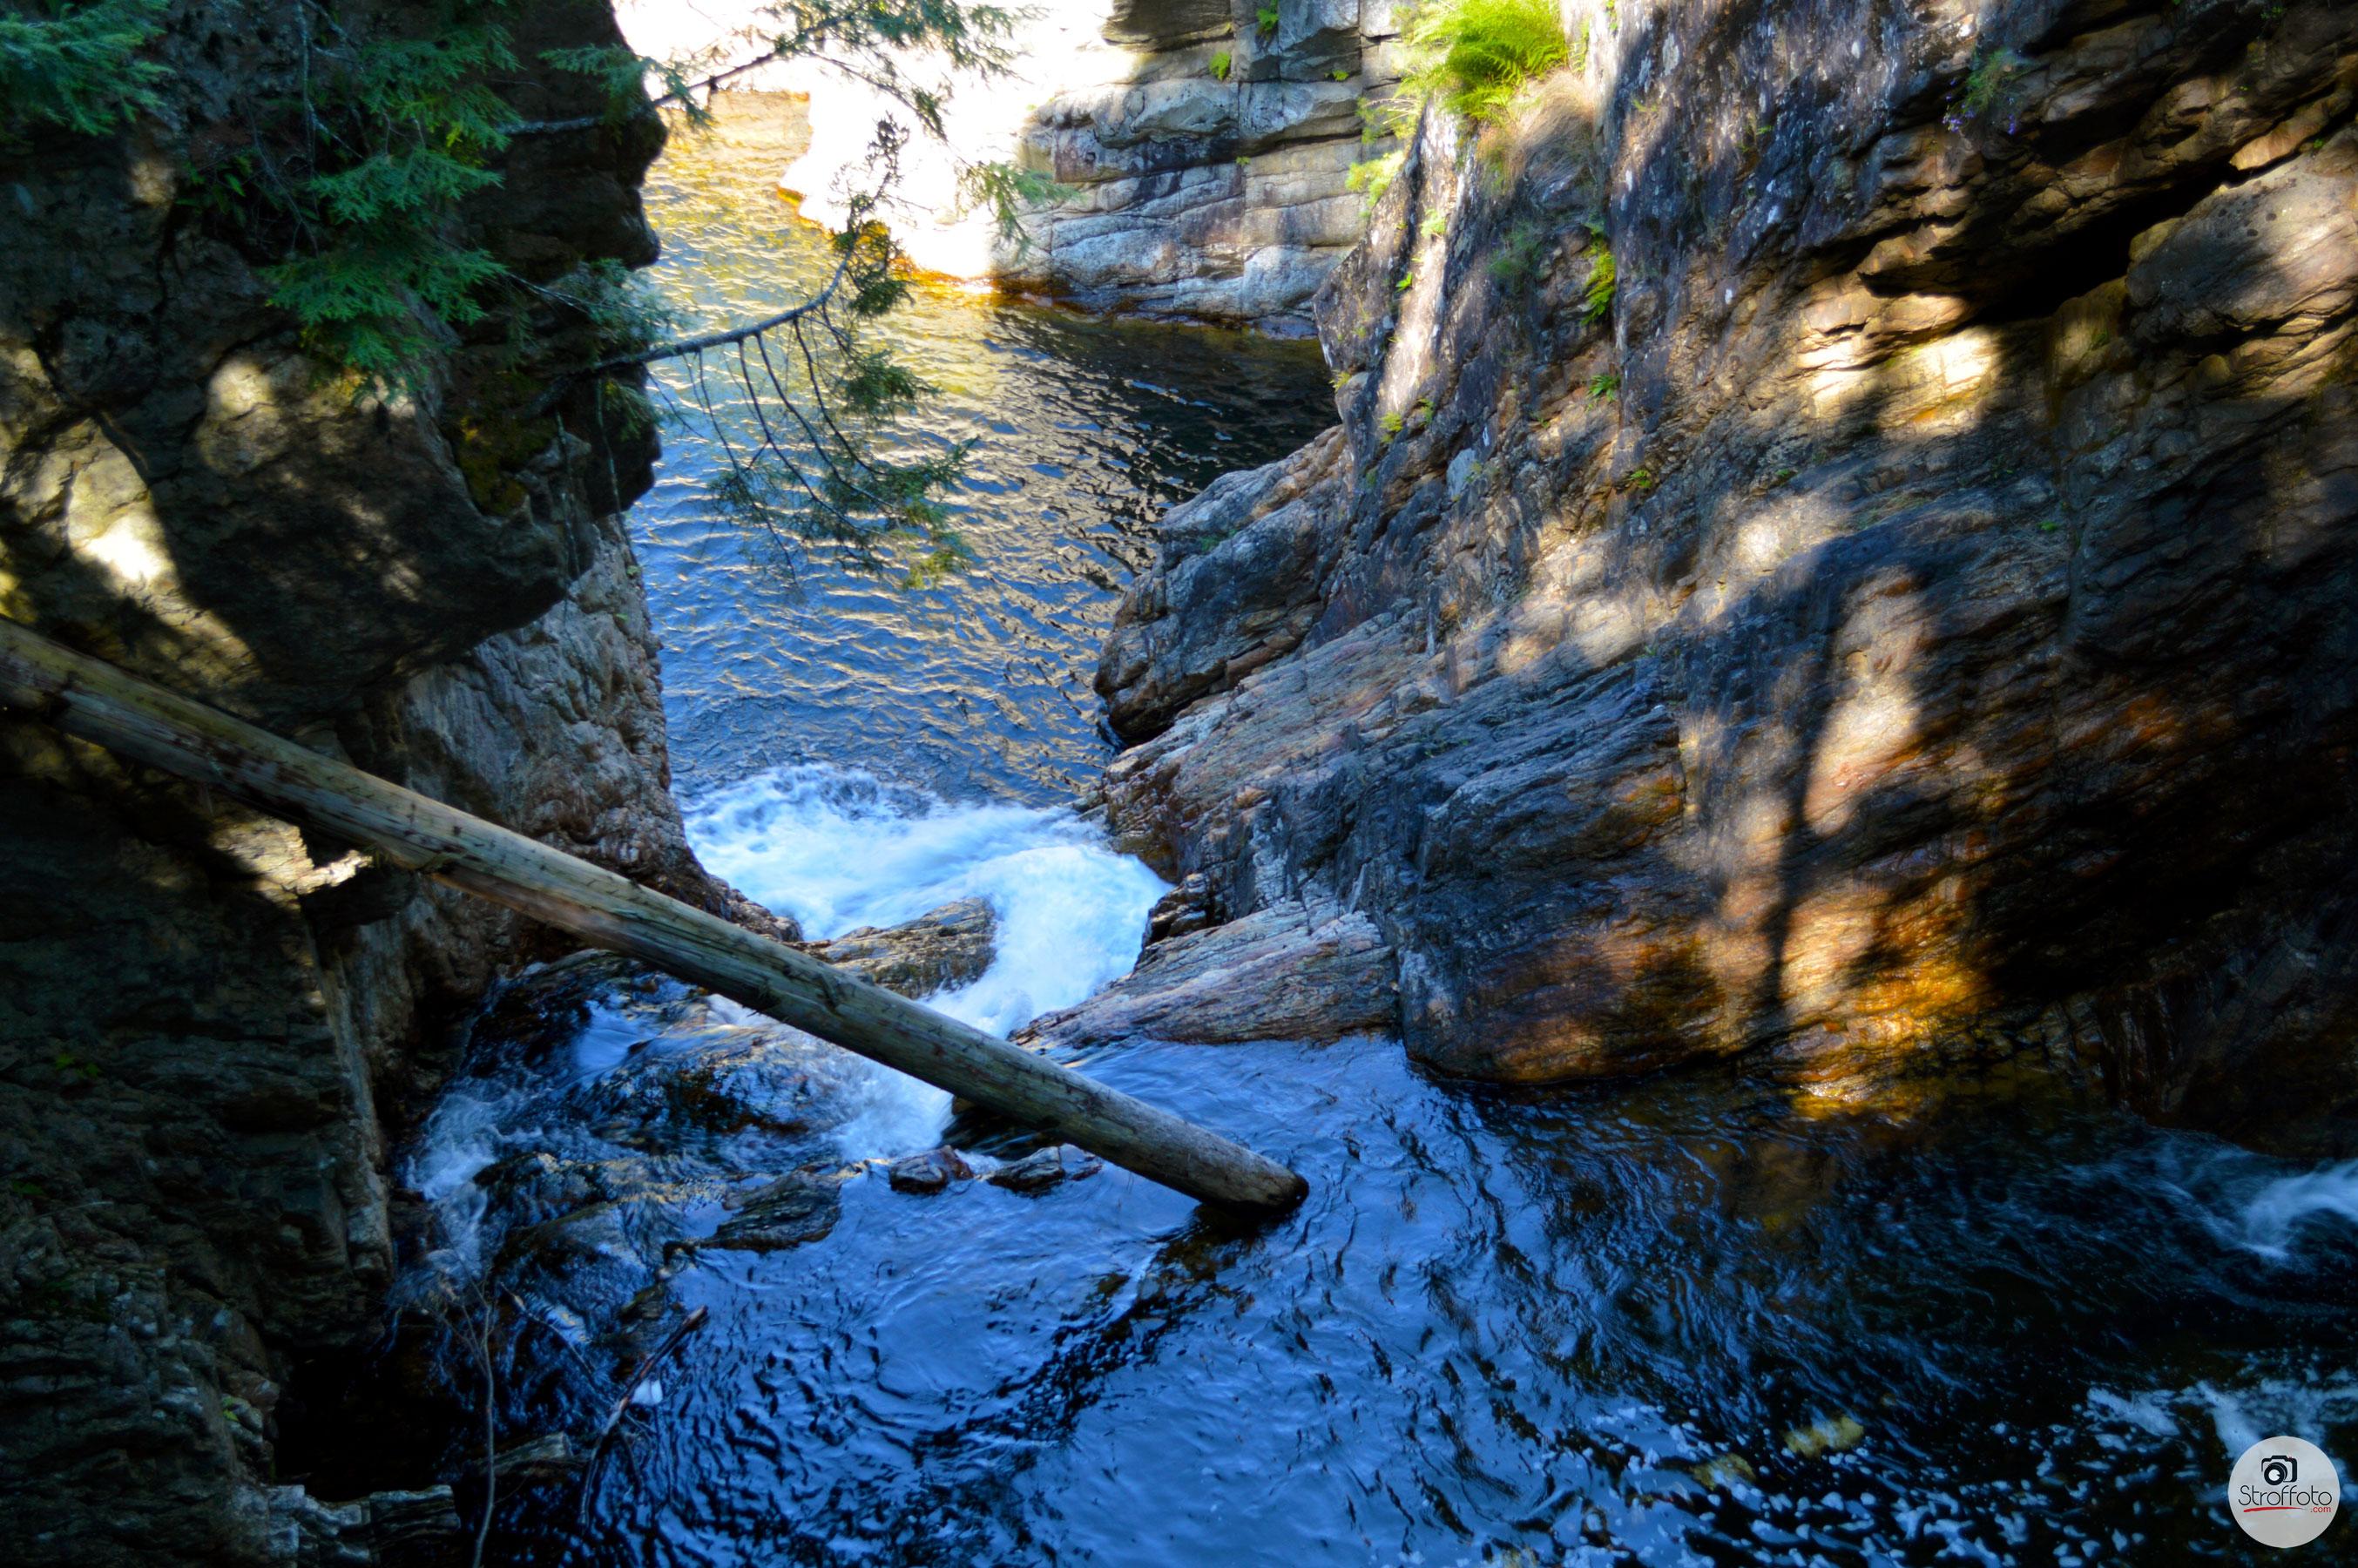 The Falls of Lana